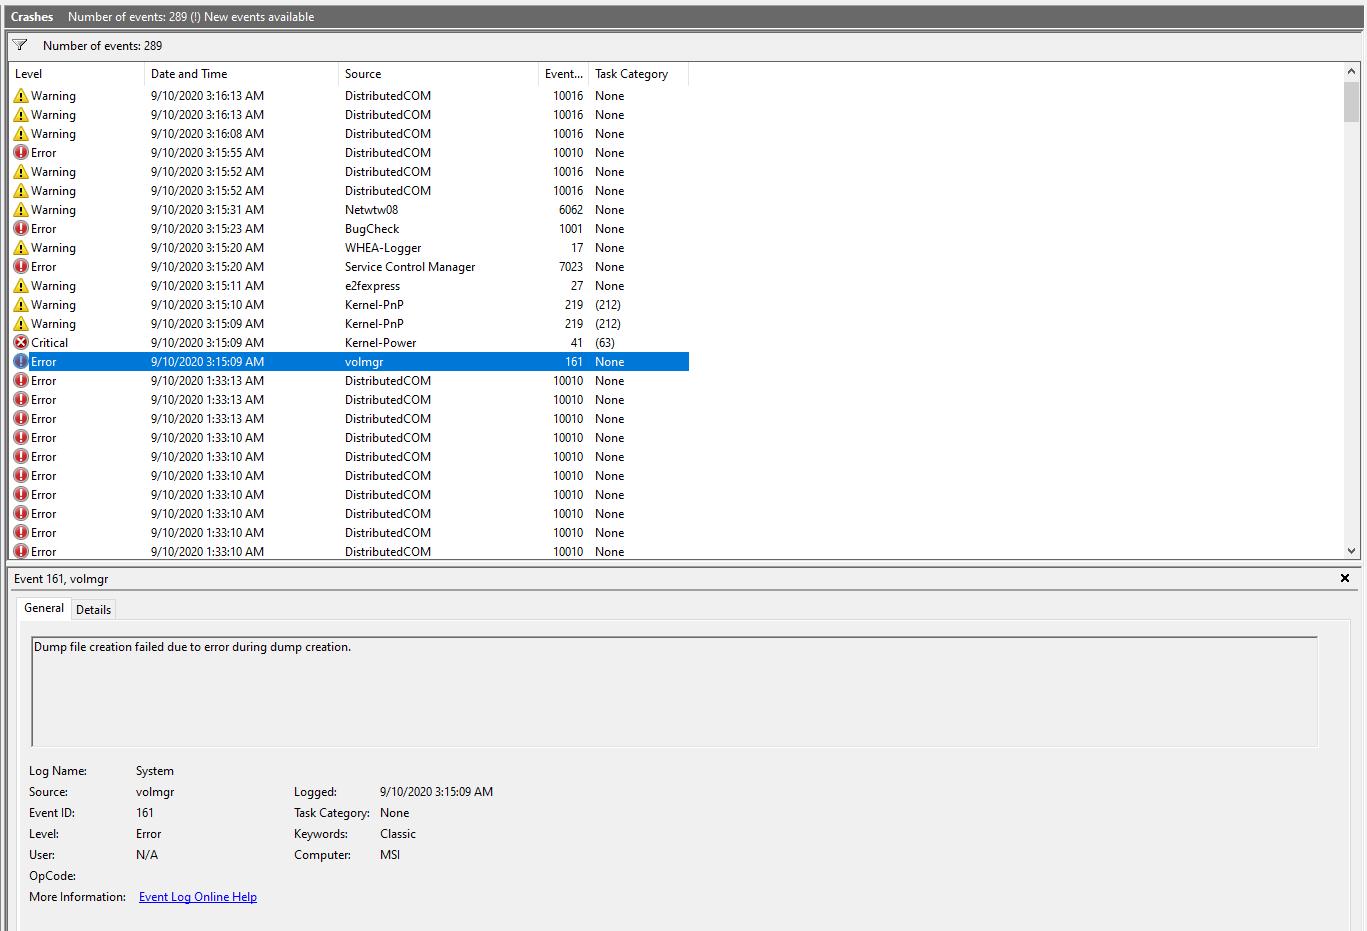 BSOD - volmgr 161, then Kernel-Power 41 51160418-e3df-4287-99e8-fc48b86765b5?upload=true.png